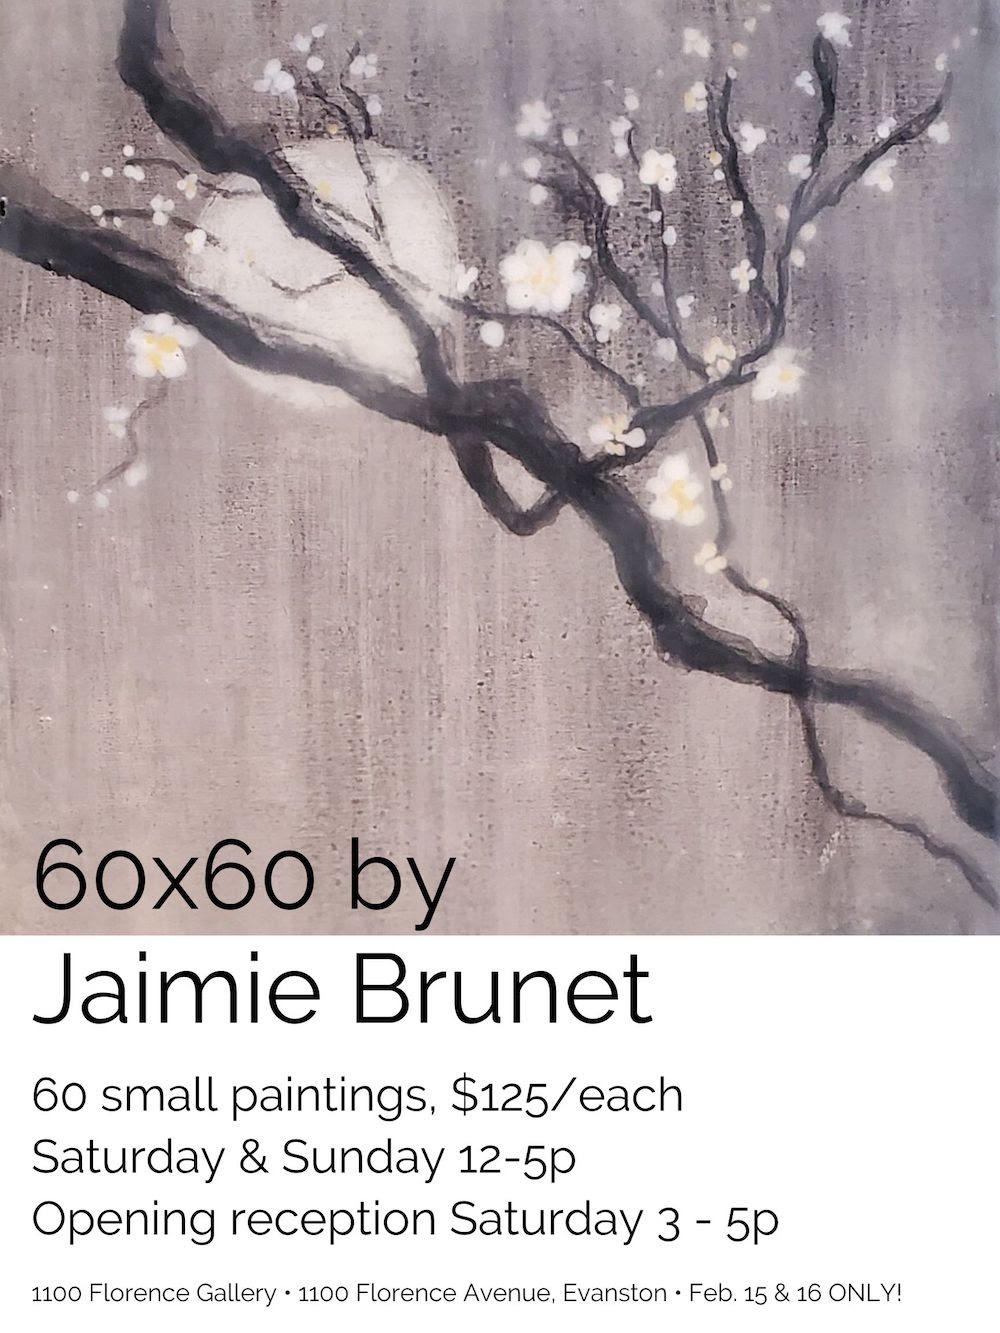 Jaimie Brunet Evanston Art